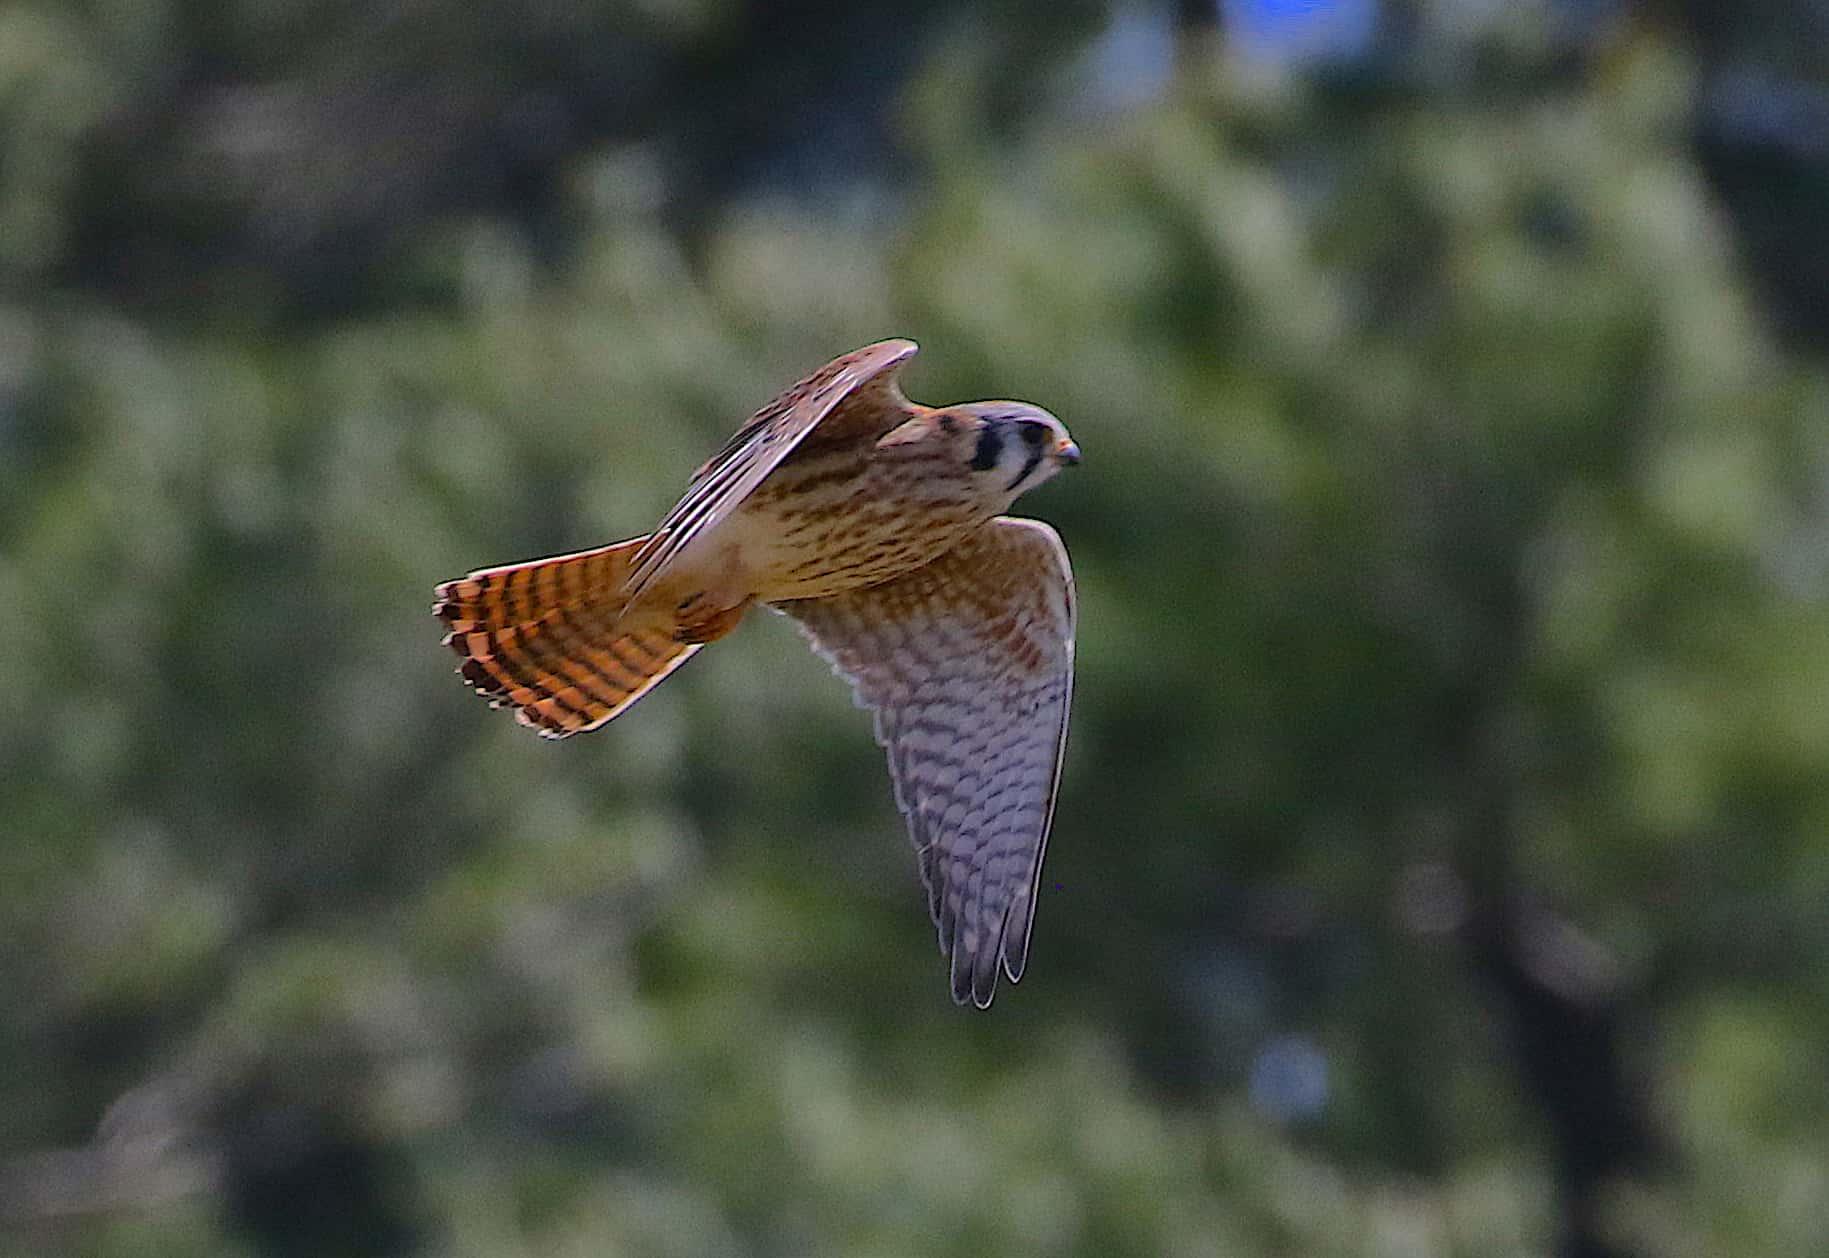 american kestrel female bird in flight